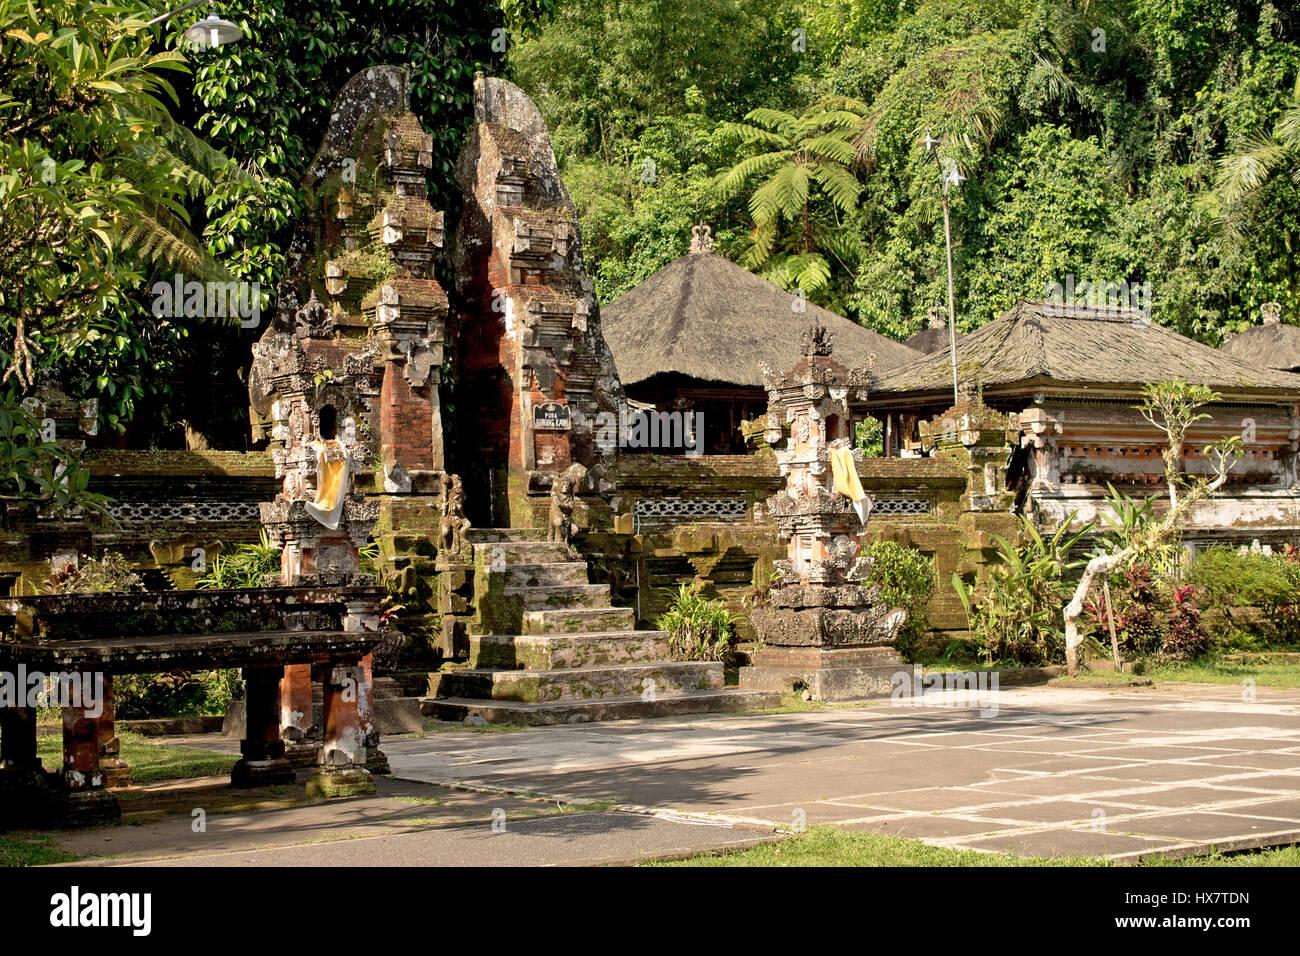 stone gate in Pura Tirta Empul, ubud temple, bali - Stock Image